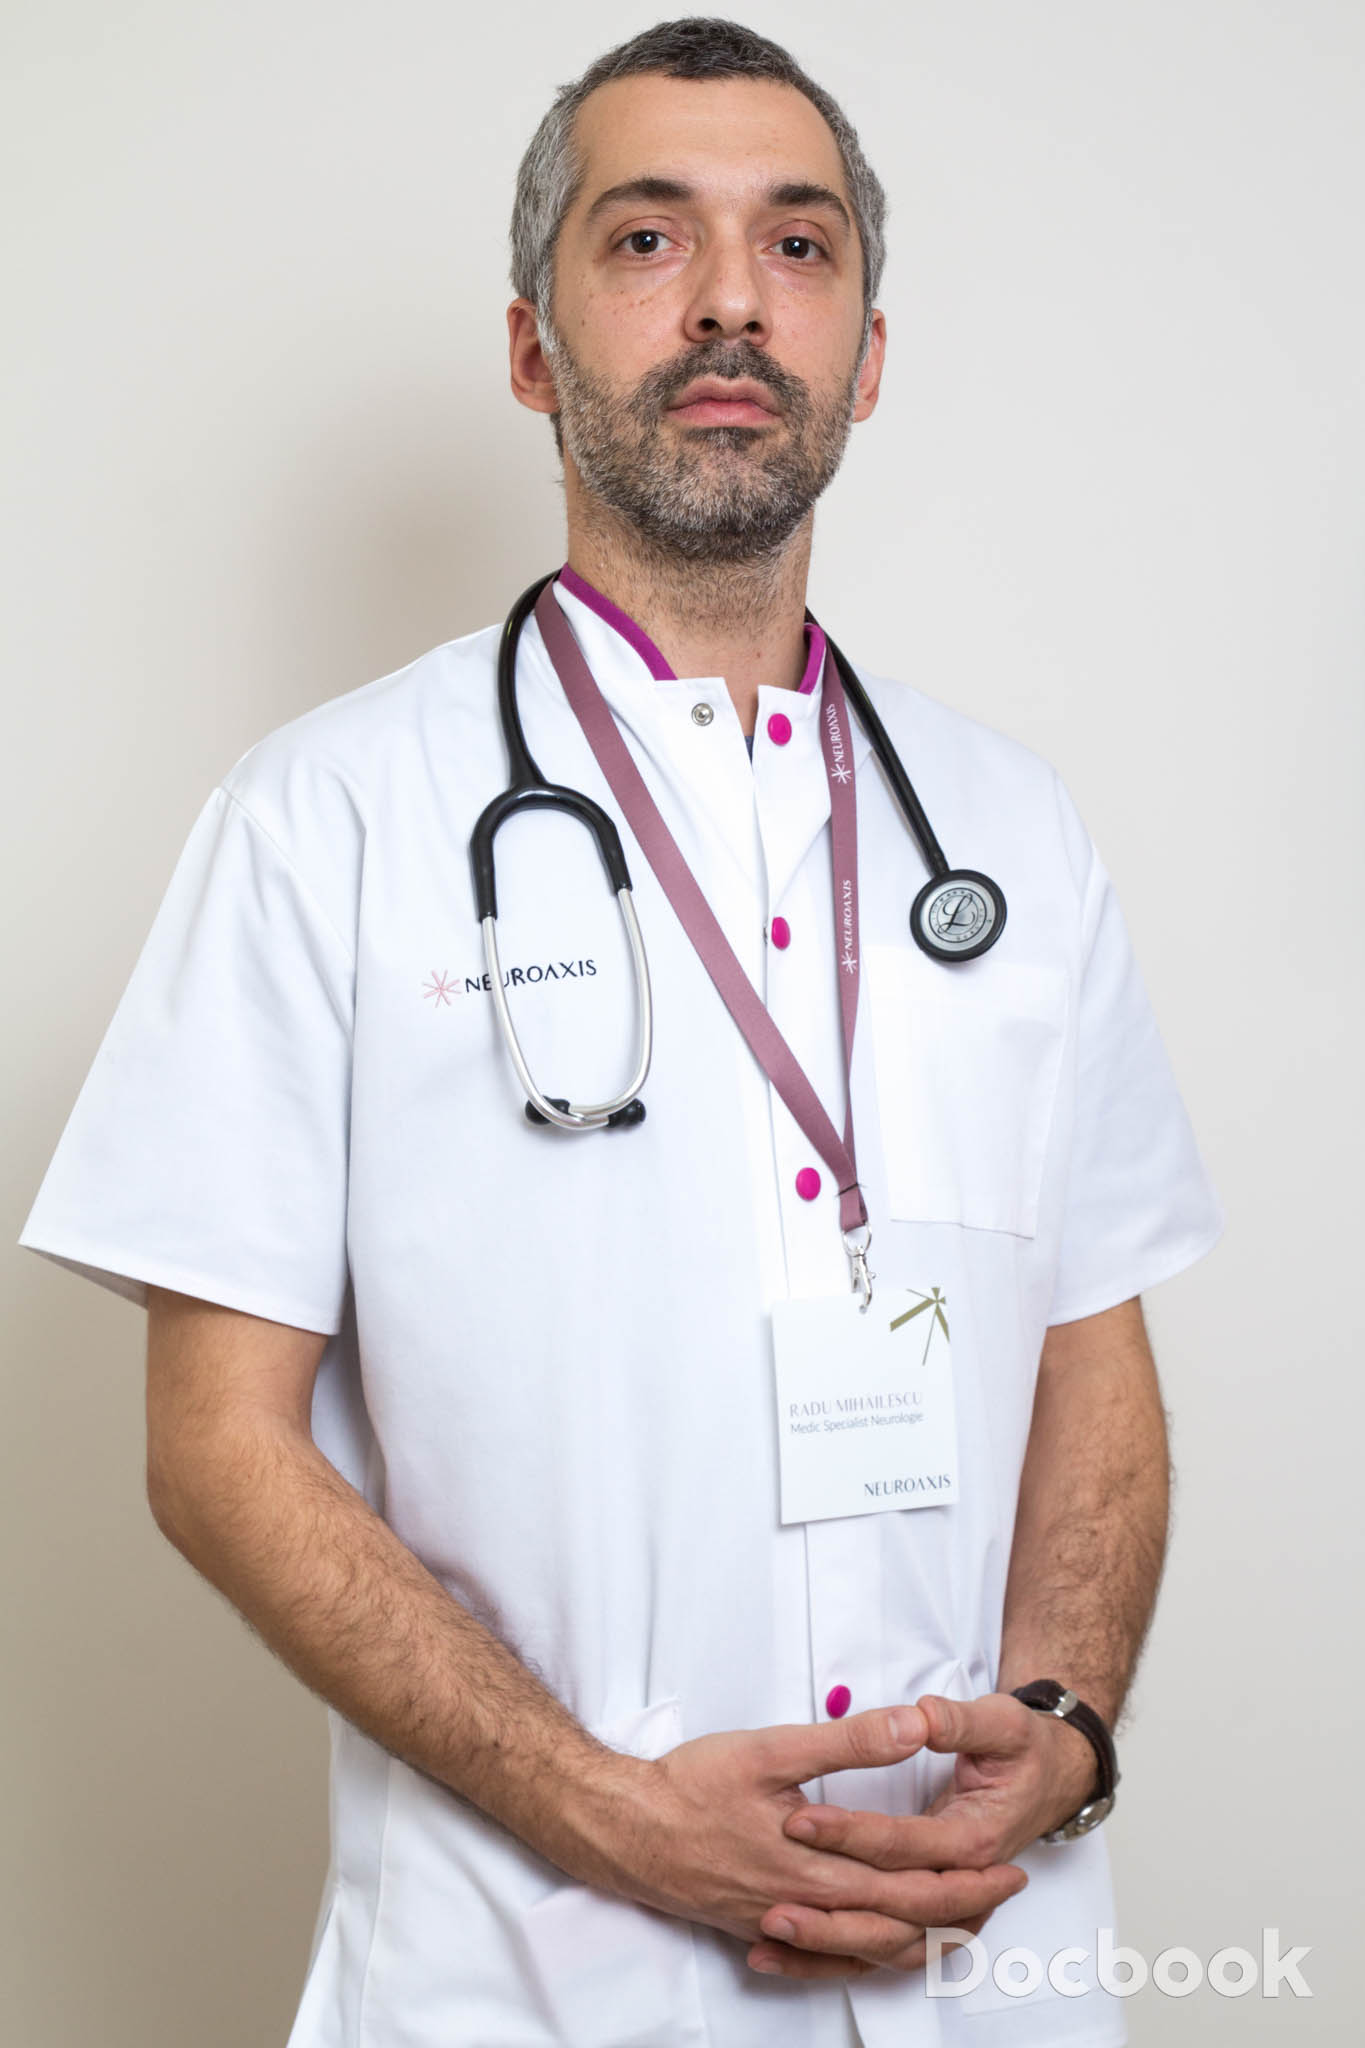 Dr. Radu Mihailescu